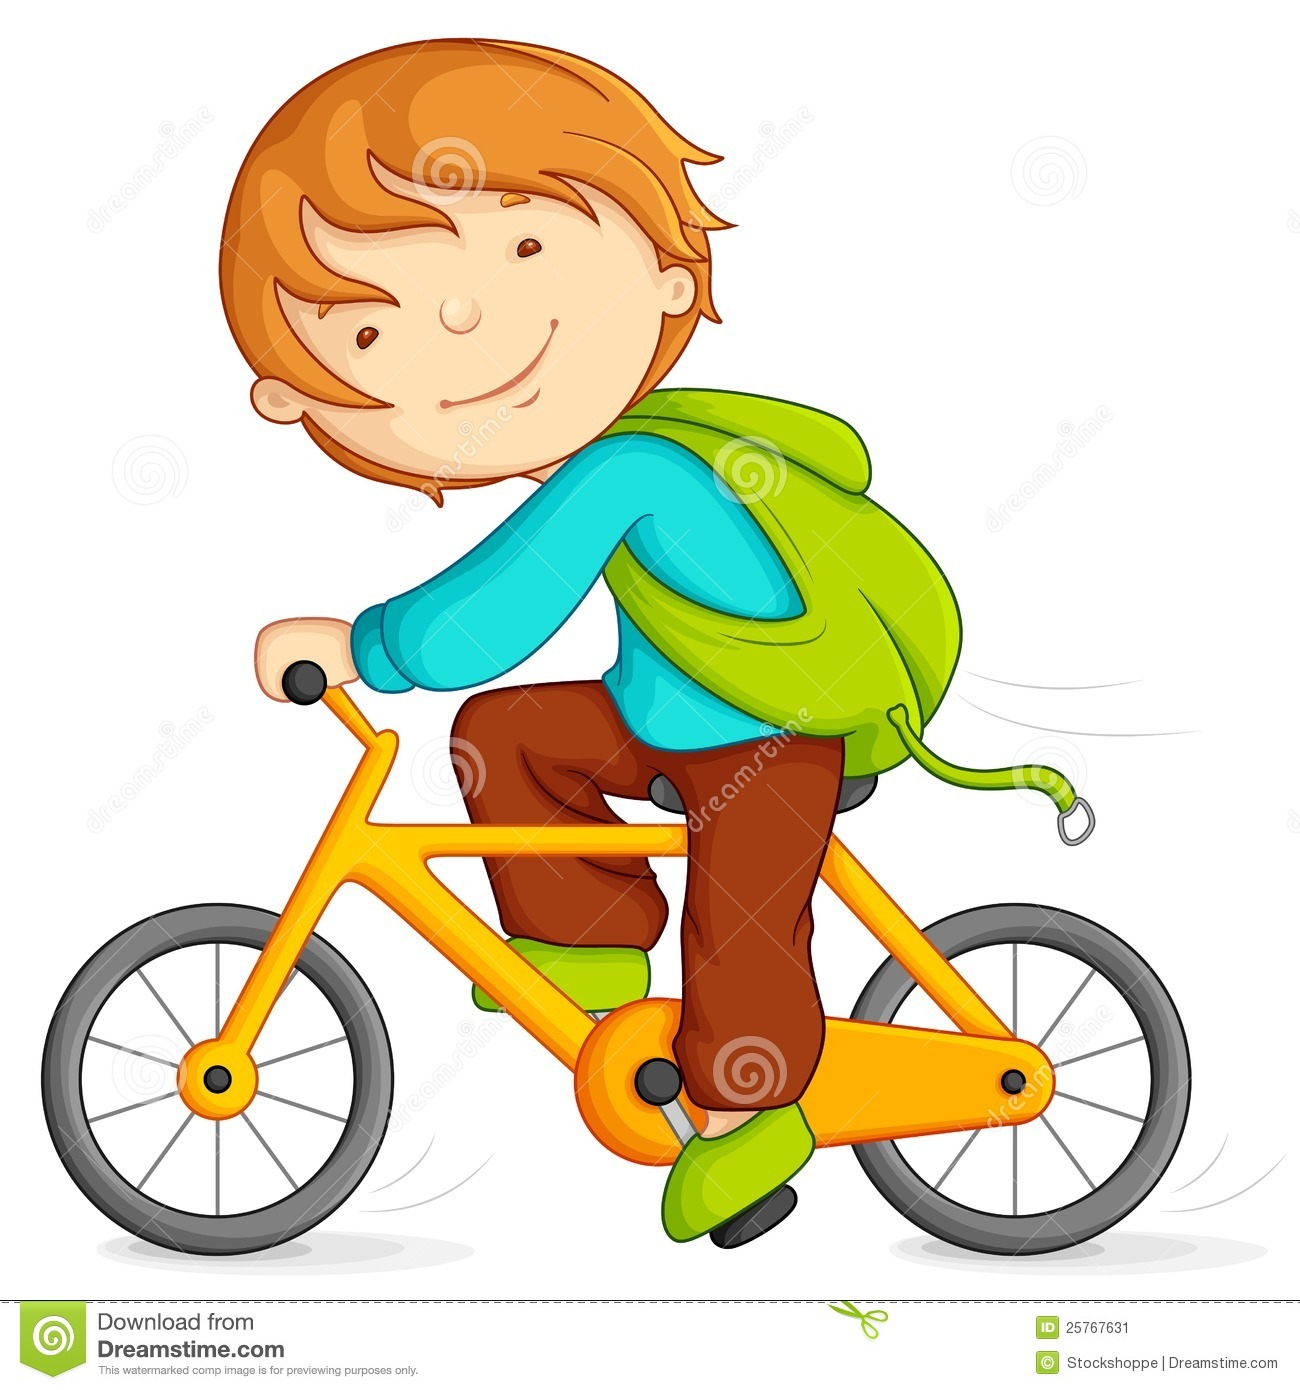 Riding bikes clipart clipart Child Riding A Bike Clipart | Clipart Panda - Free Clipart ... clipart